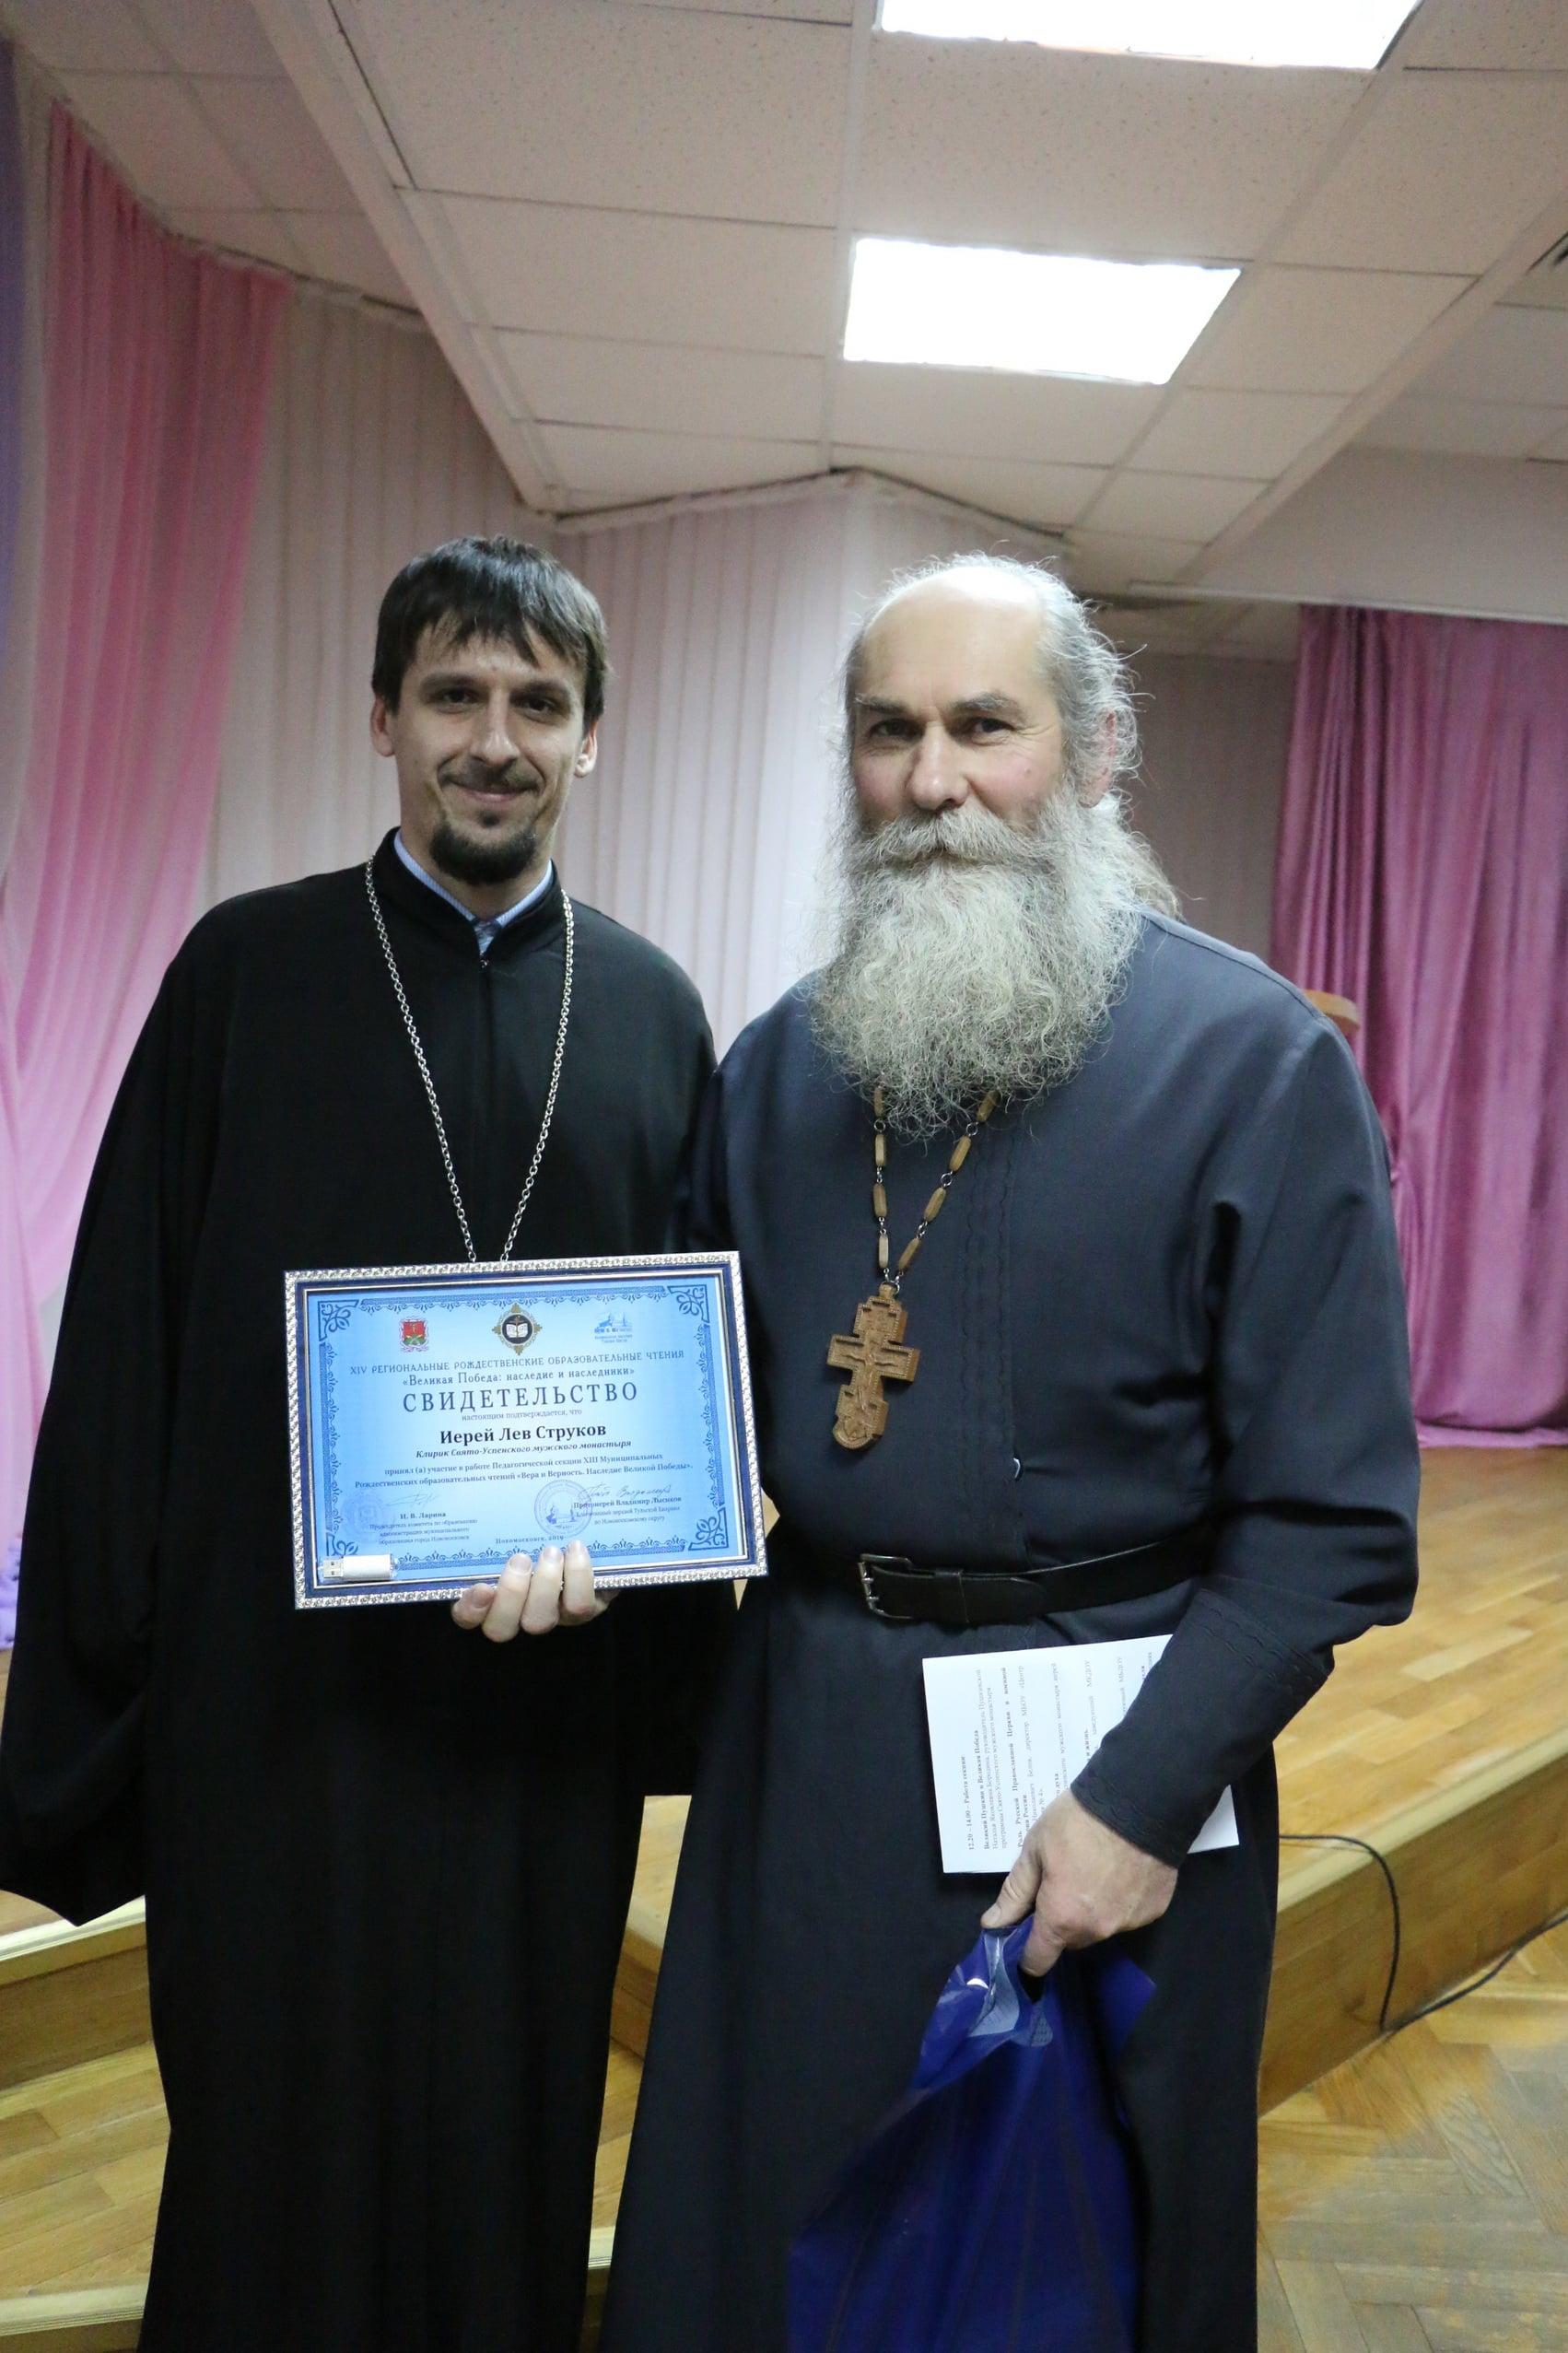 http://monuspen.ru/photoreports/06f1f0951a3799a9c804c7f0881a7693.JPG